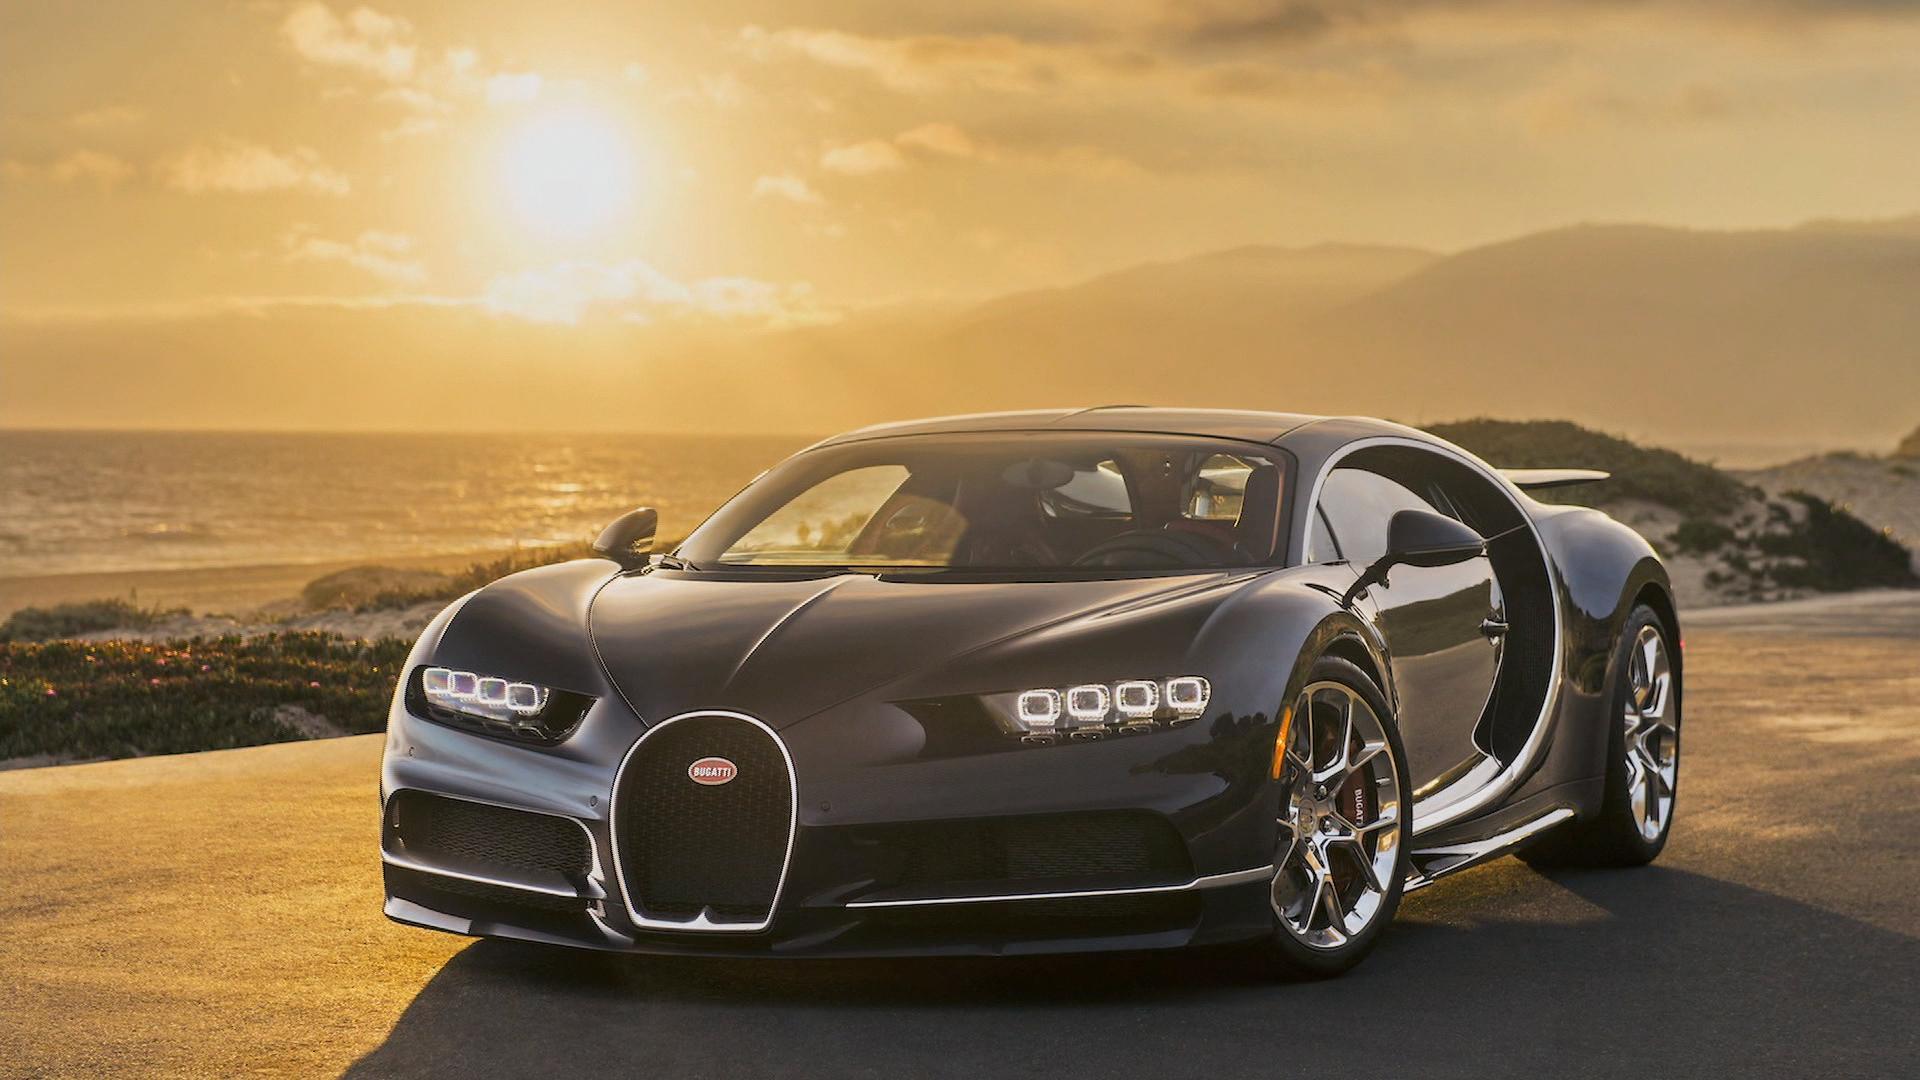 0714_CTM_3MBugatti_VanCleave Stunning Bugatti Veyron Price In Brazil Cars Trend